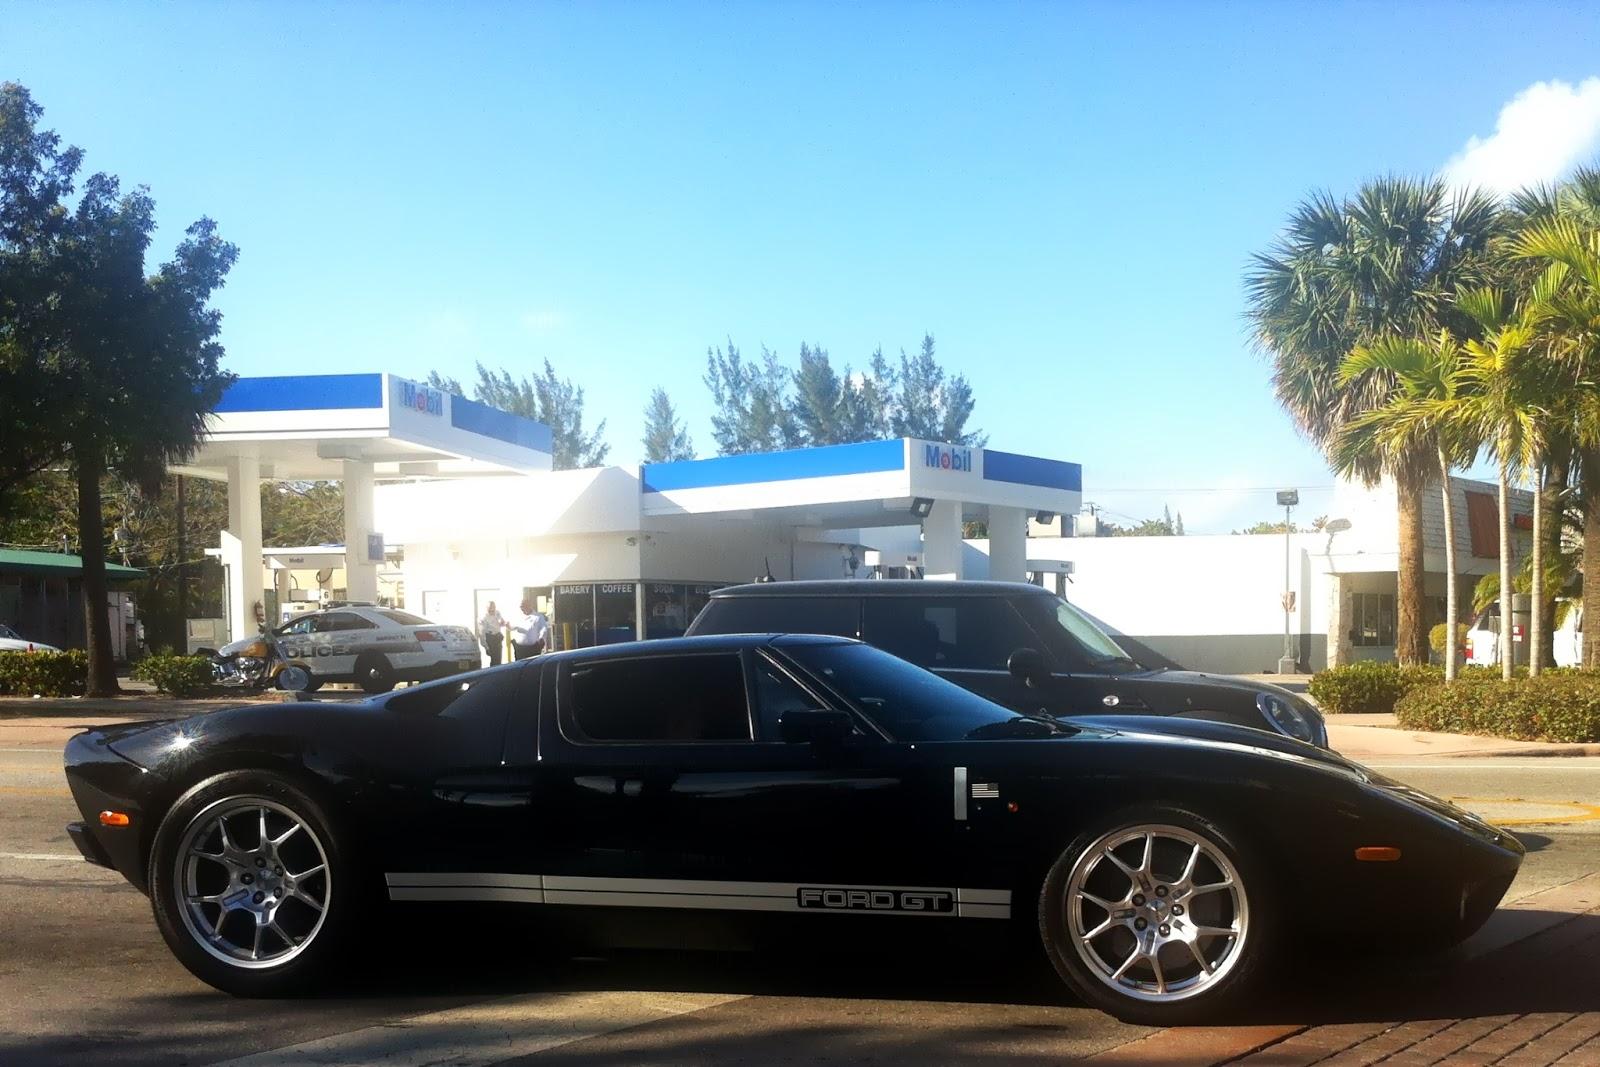 Ford Gt On Key Biscayne